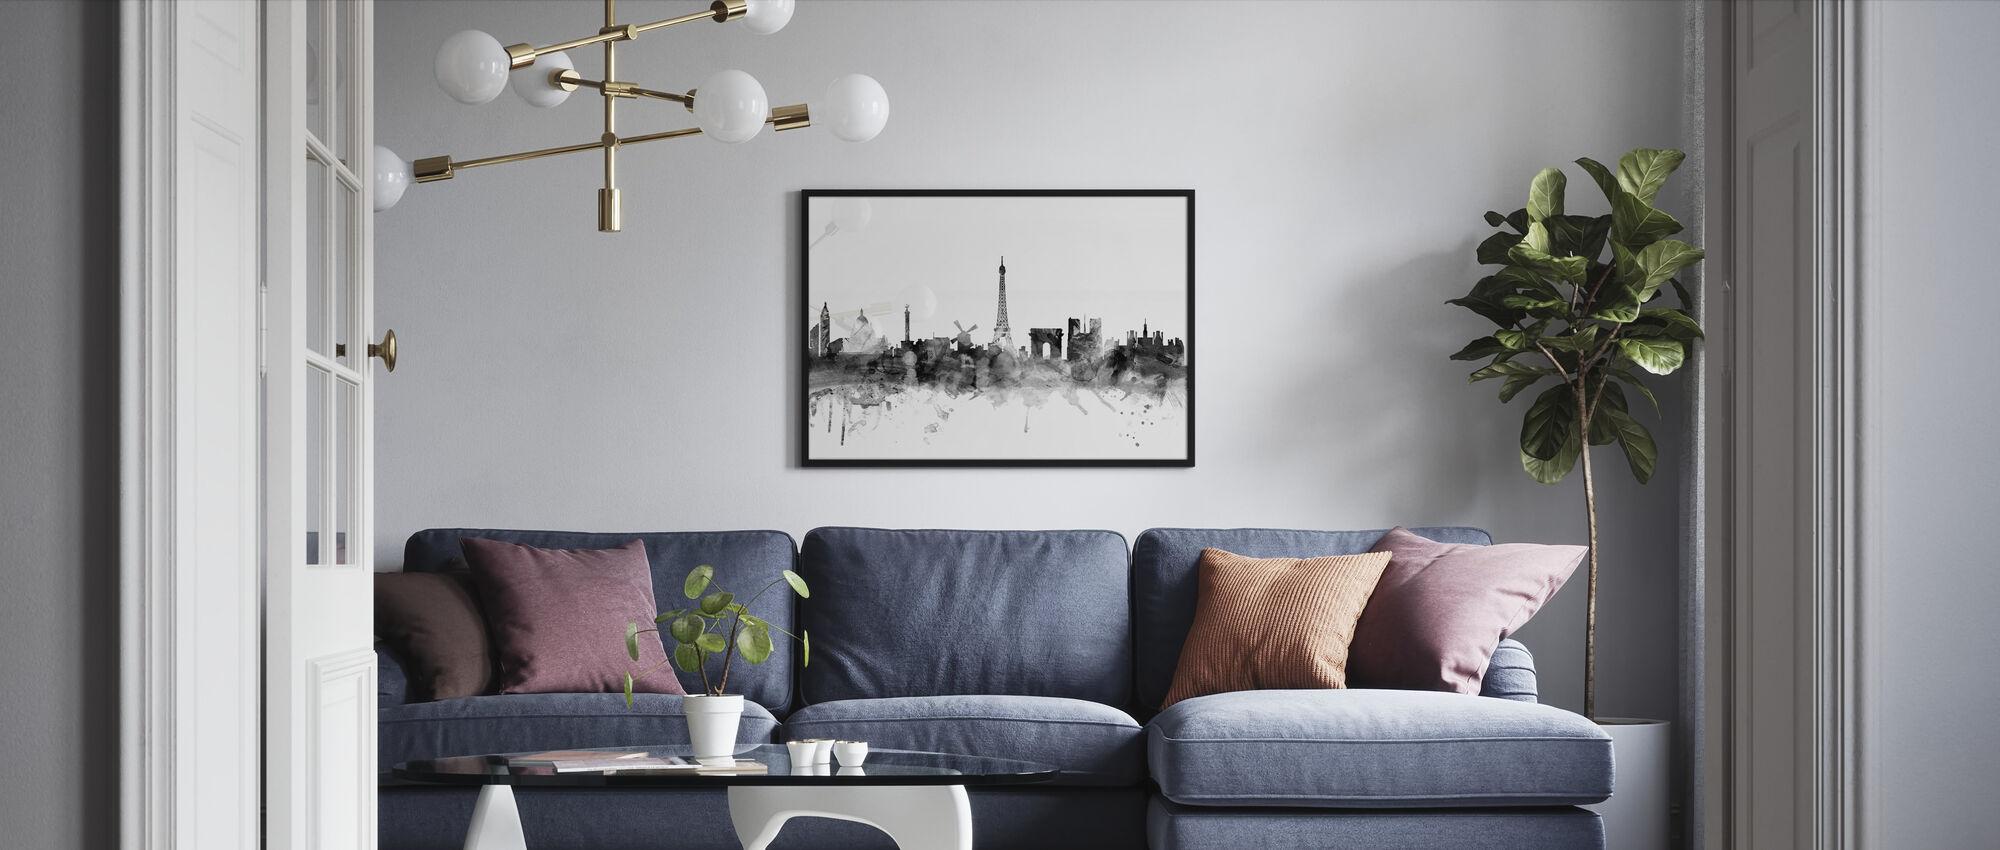 Paris Skyline Black - Framed print - Living Room